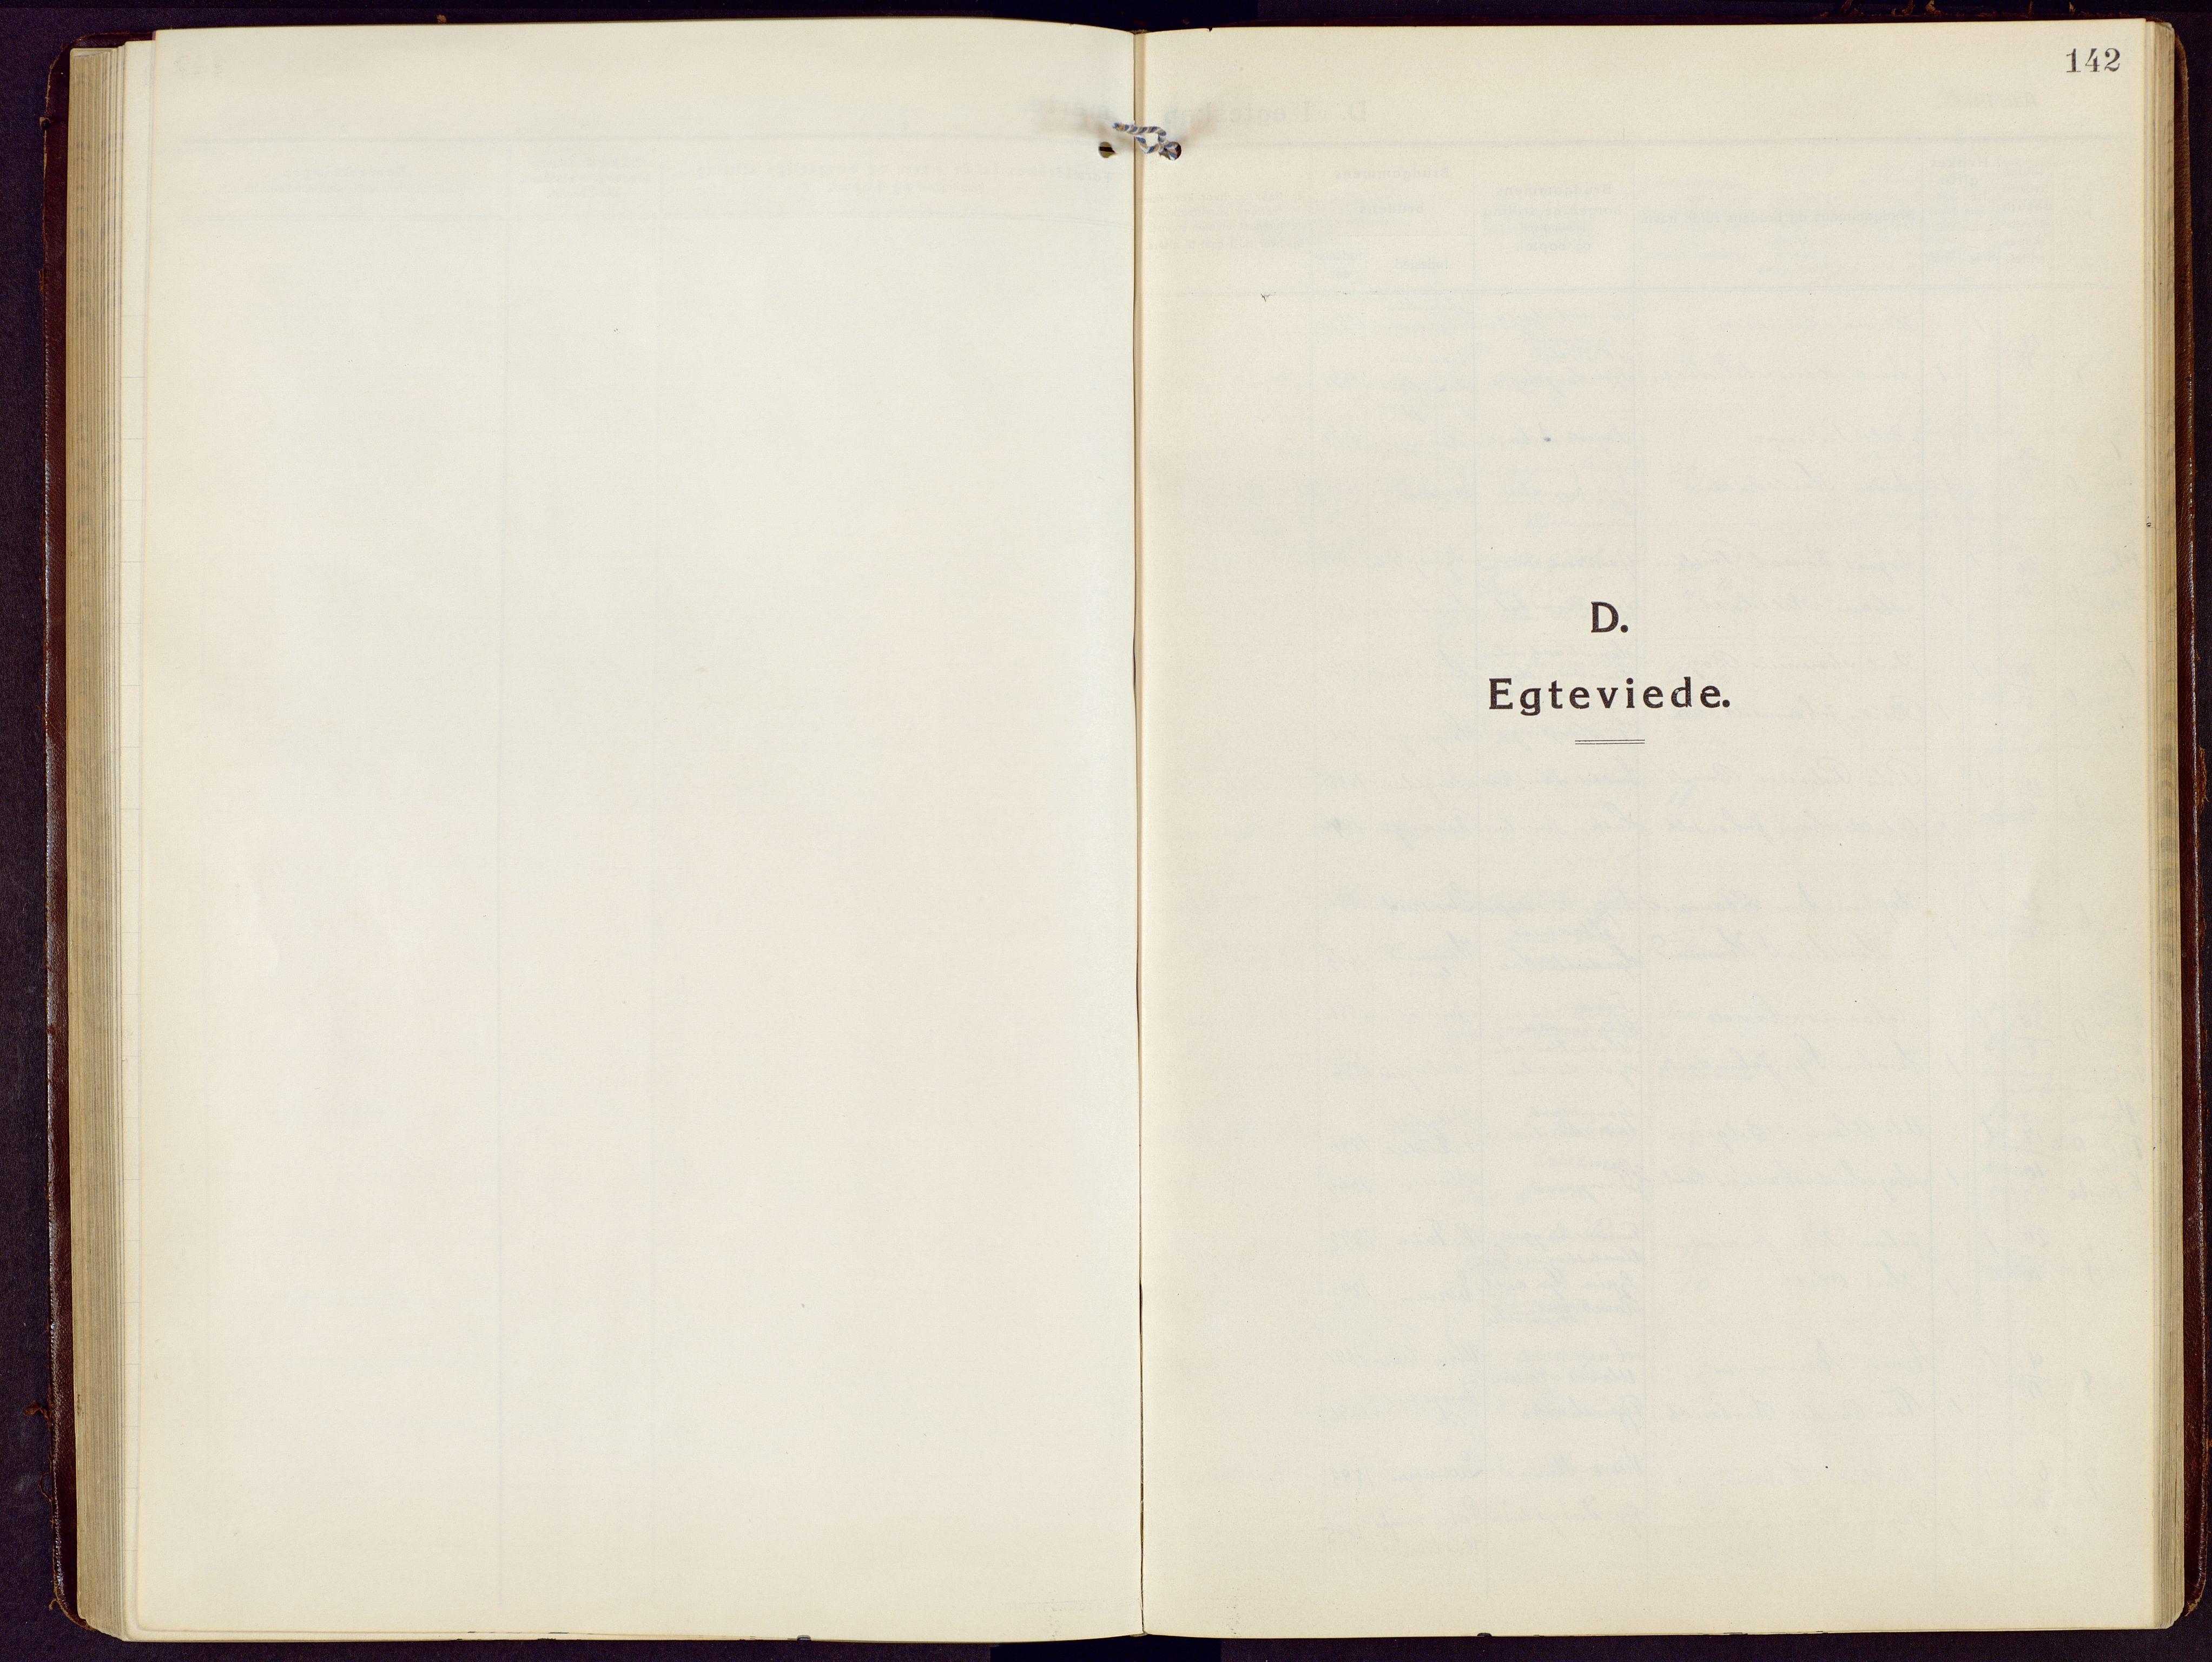 SAH, Brandbu prestekontor, Klokkerbok nr. 10, 1916-1930, s. 142